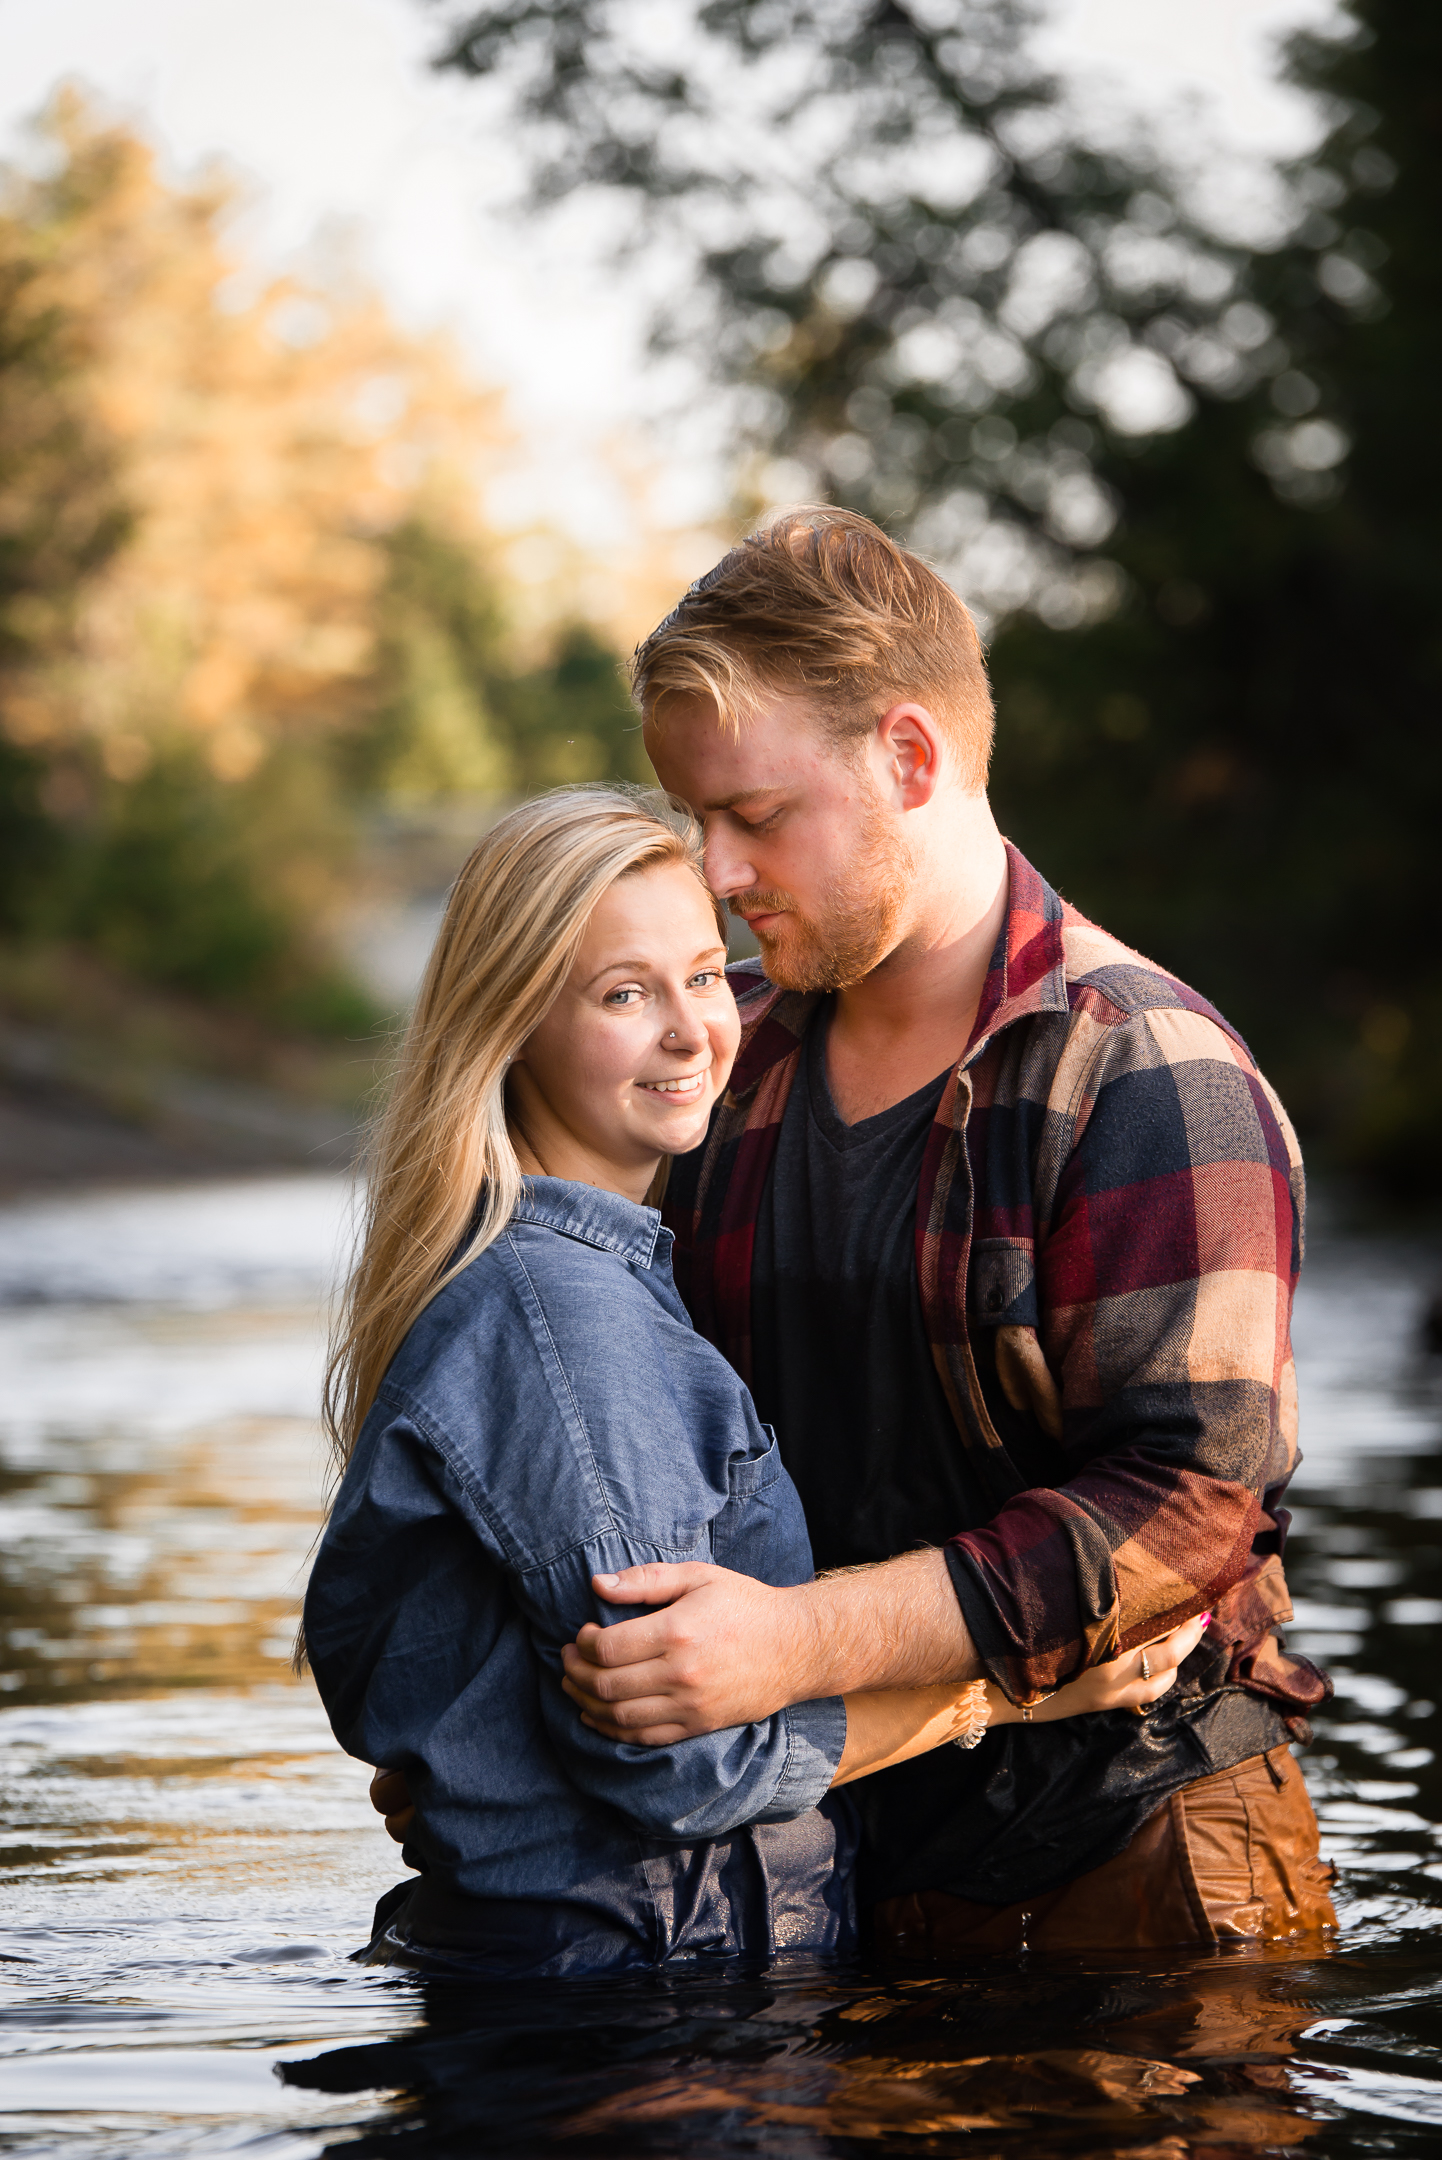 Naomi Lucienne Photography - Couples - 170923755.jpg